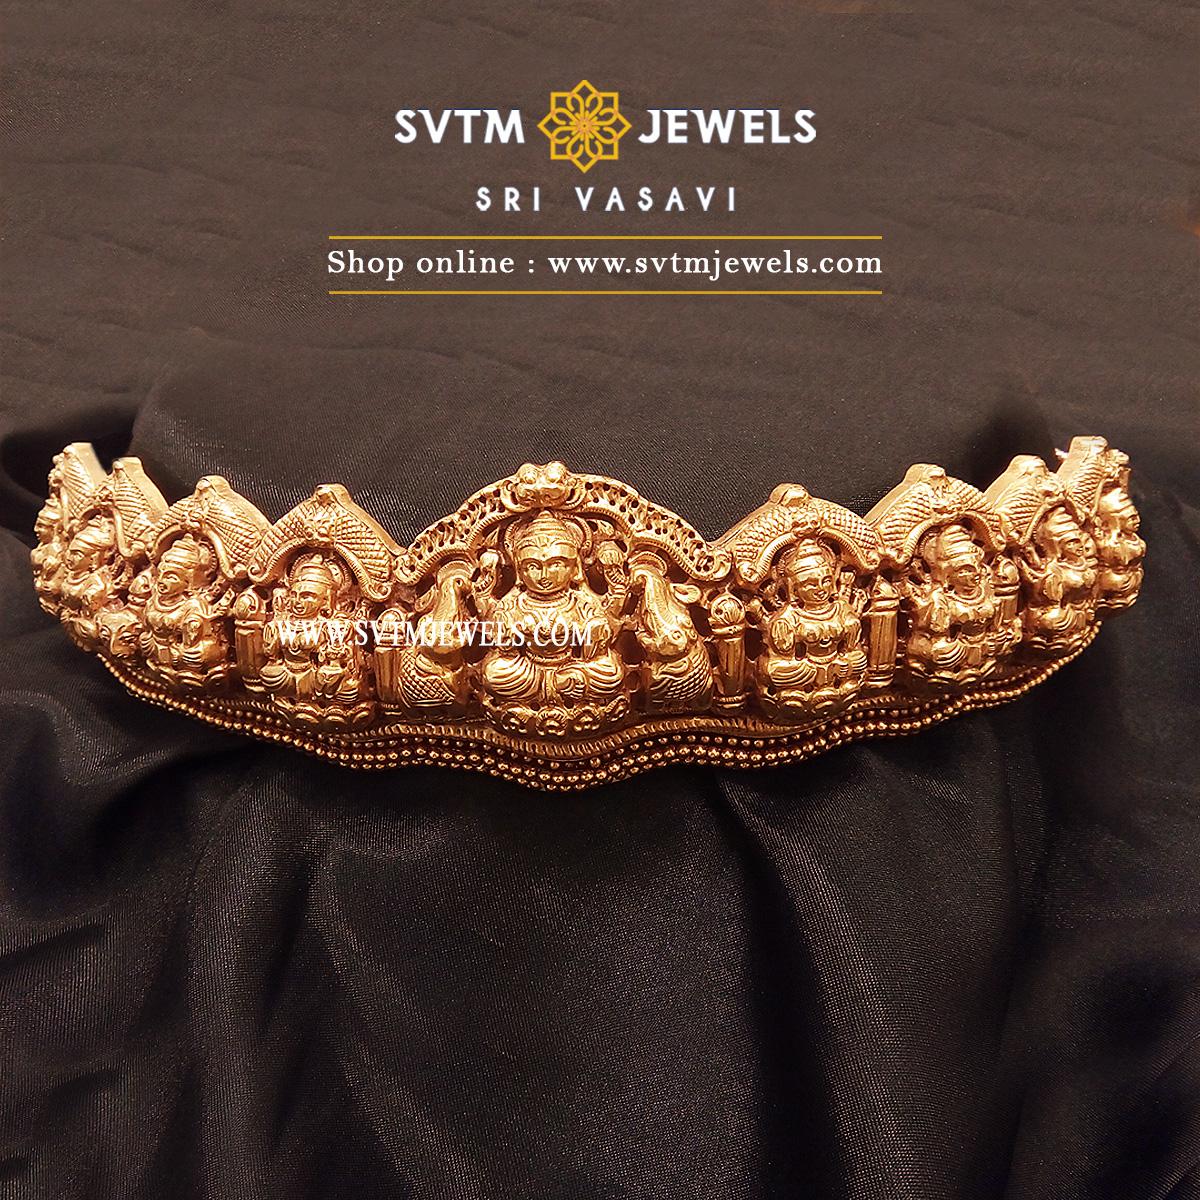 vaddanam-ottiyanam-hip-belt-designs (10)